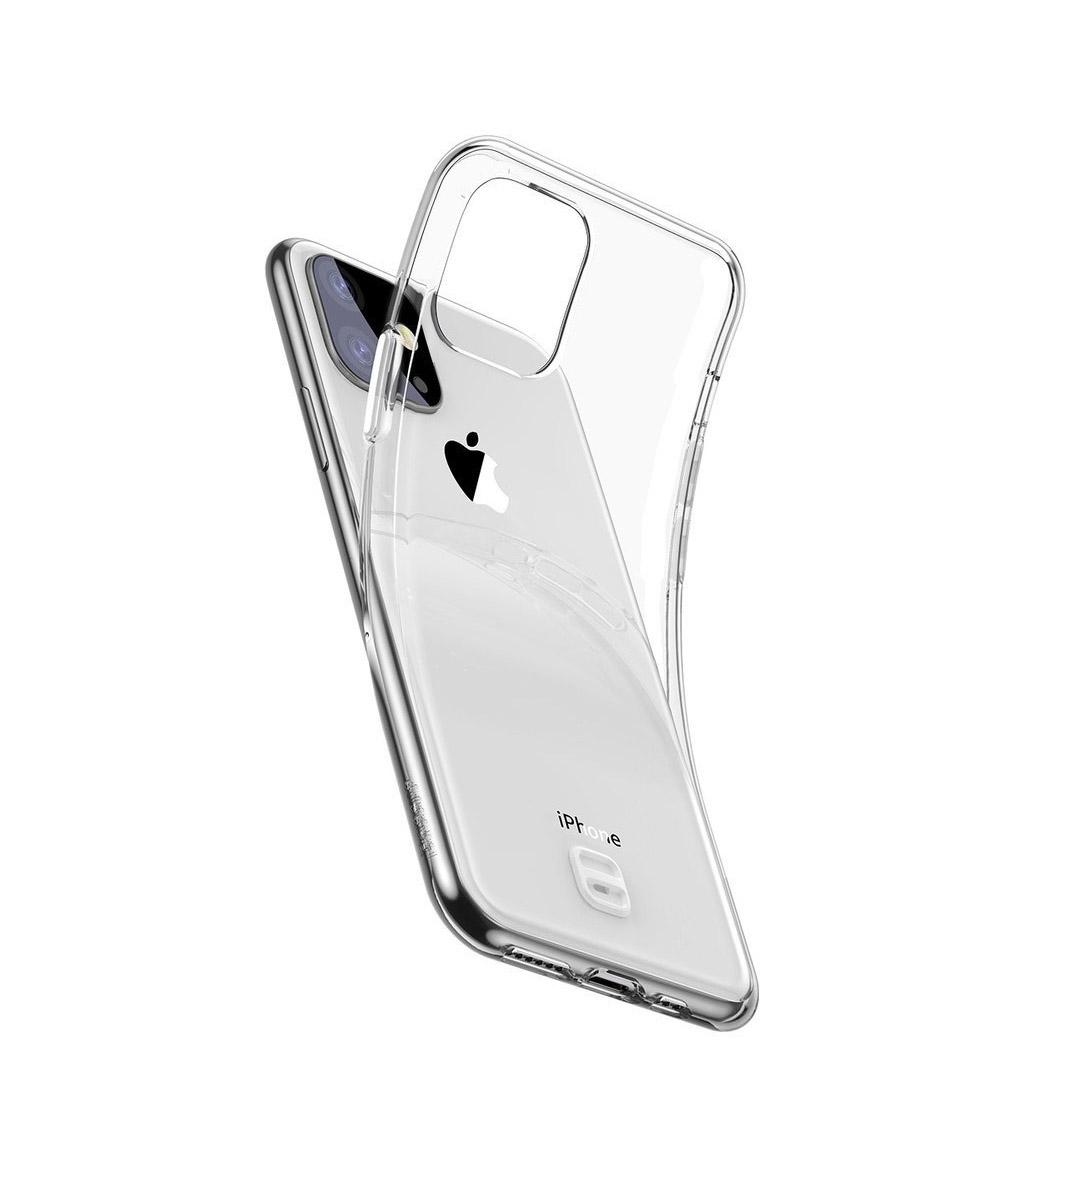 کاور باسئوس مدل WIAPIPH61S-QA02 مناسب برای گوشی موبایل اپل iPhone 11